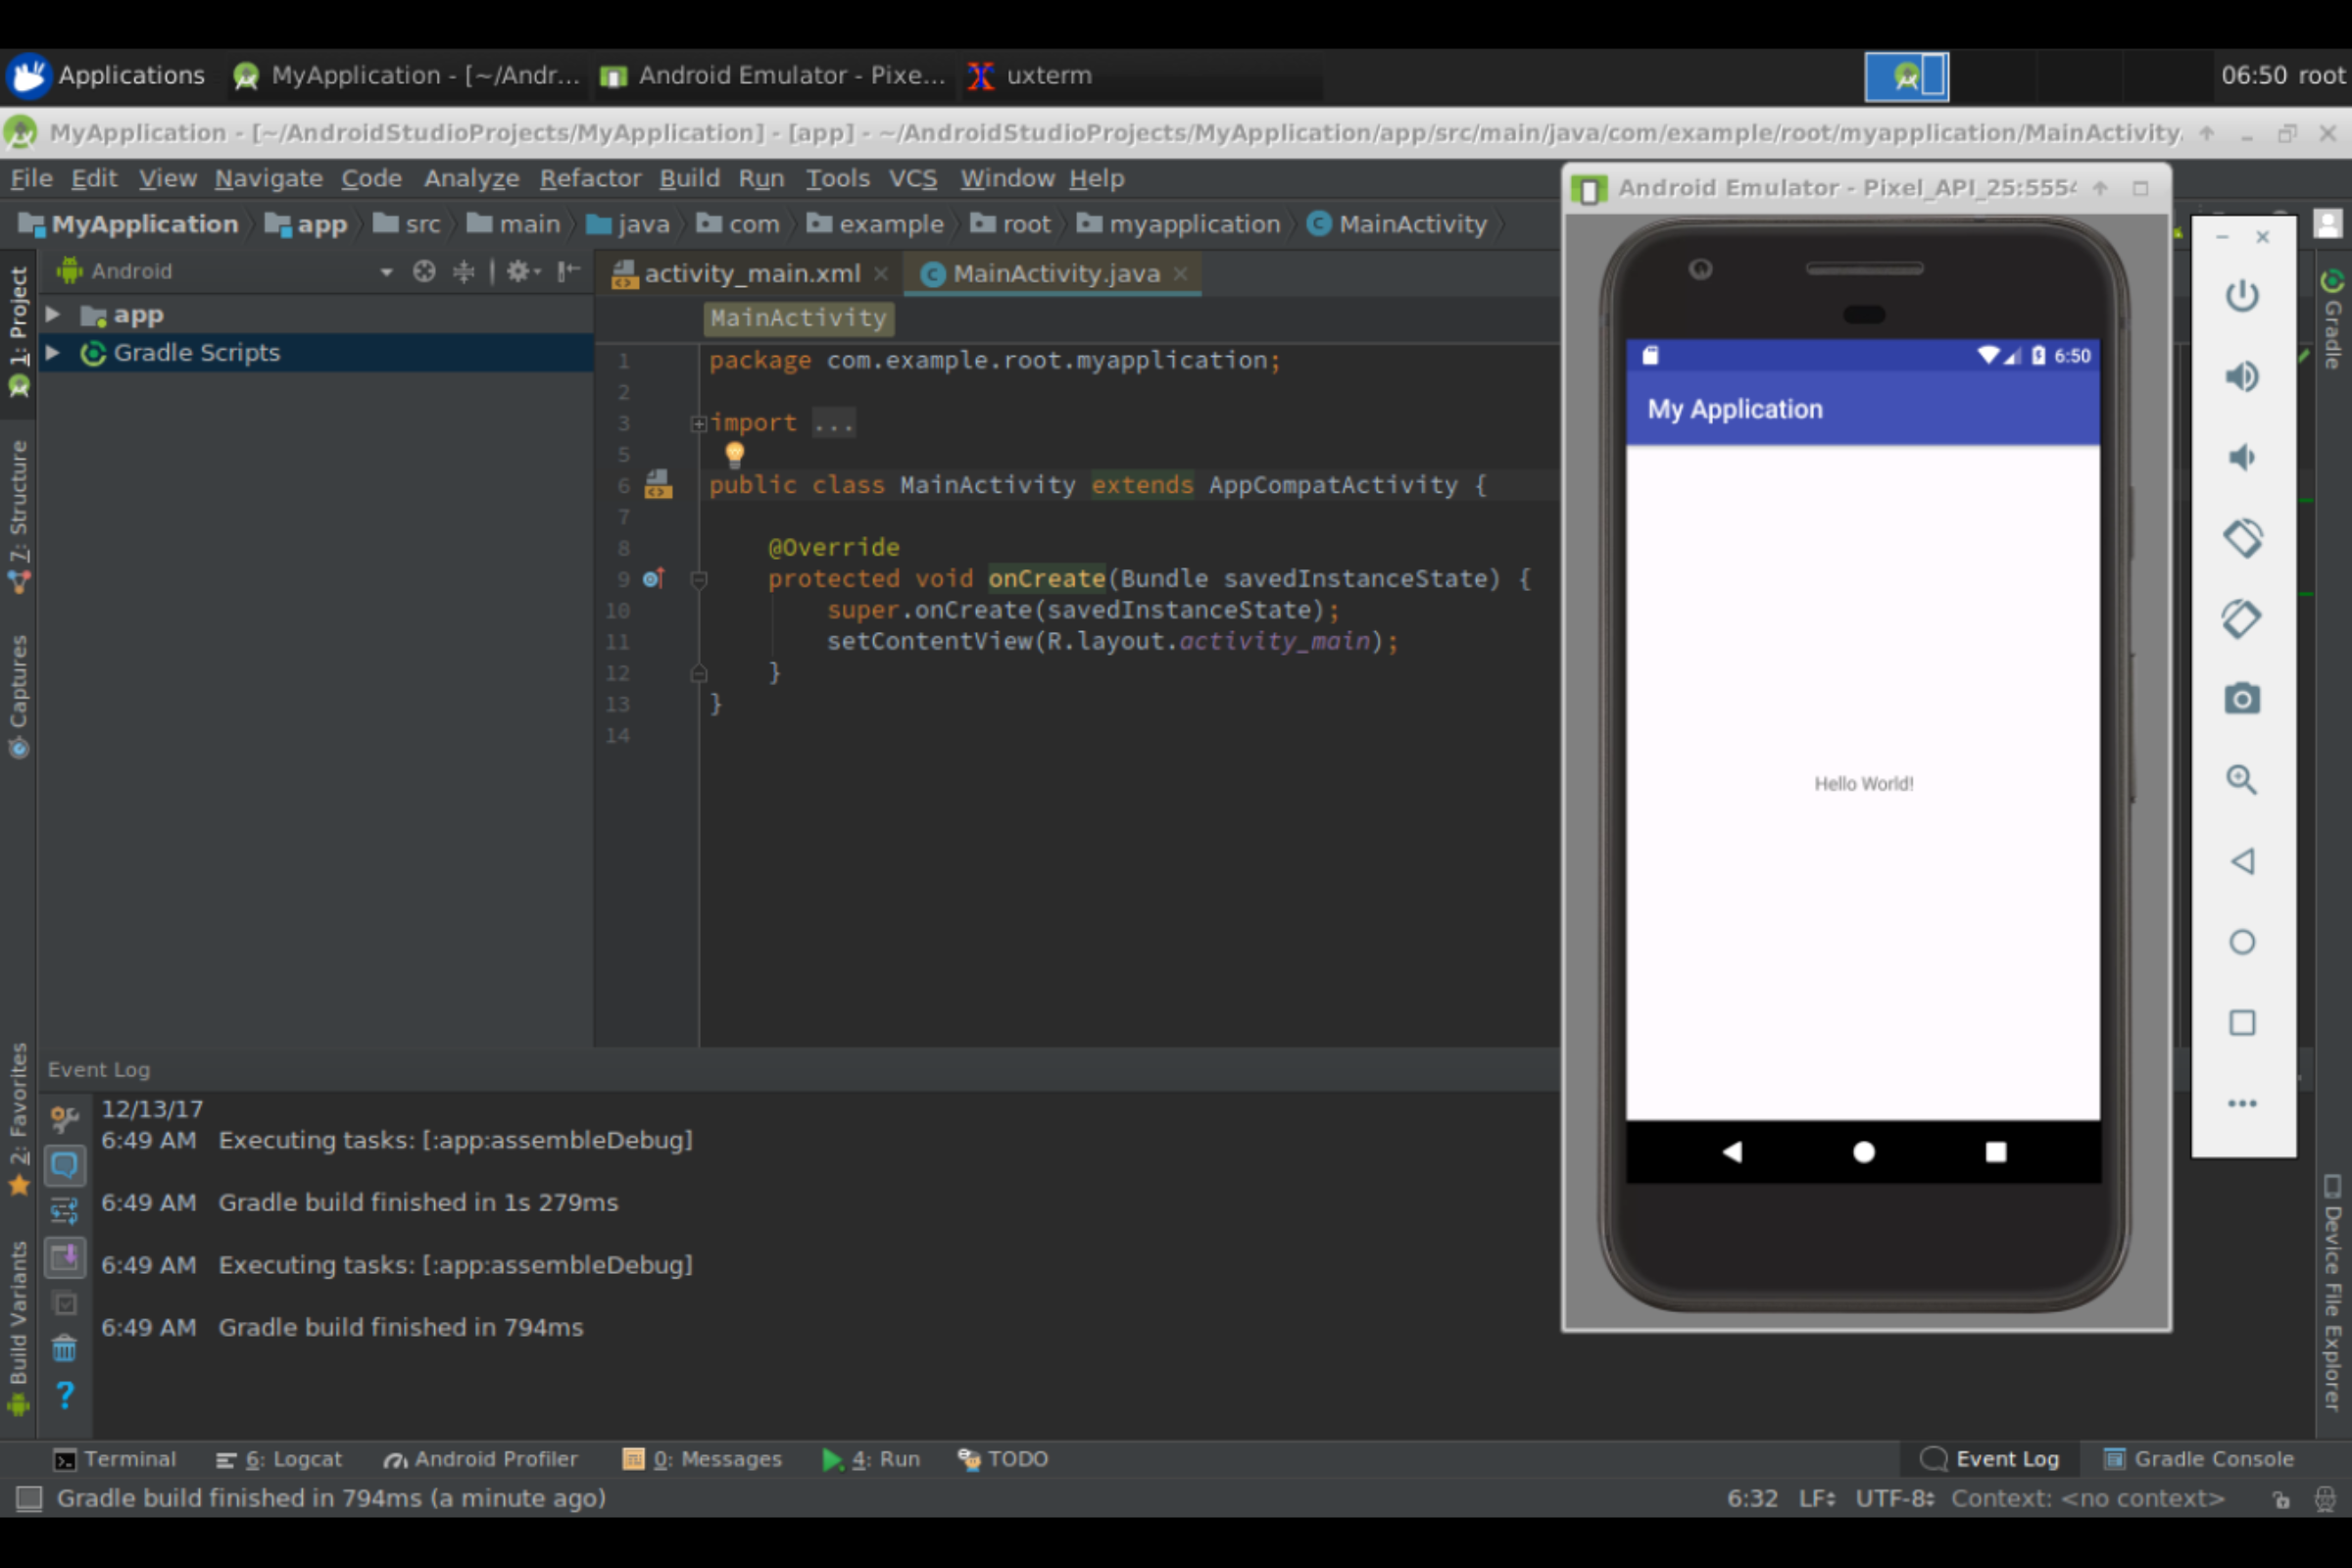 GitHub - ljishen/docker-vnc-android-studio: Android Studio